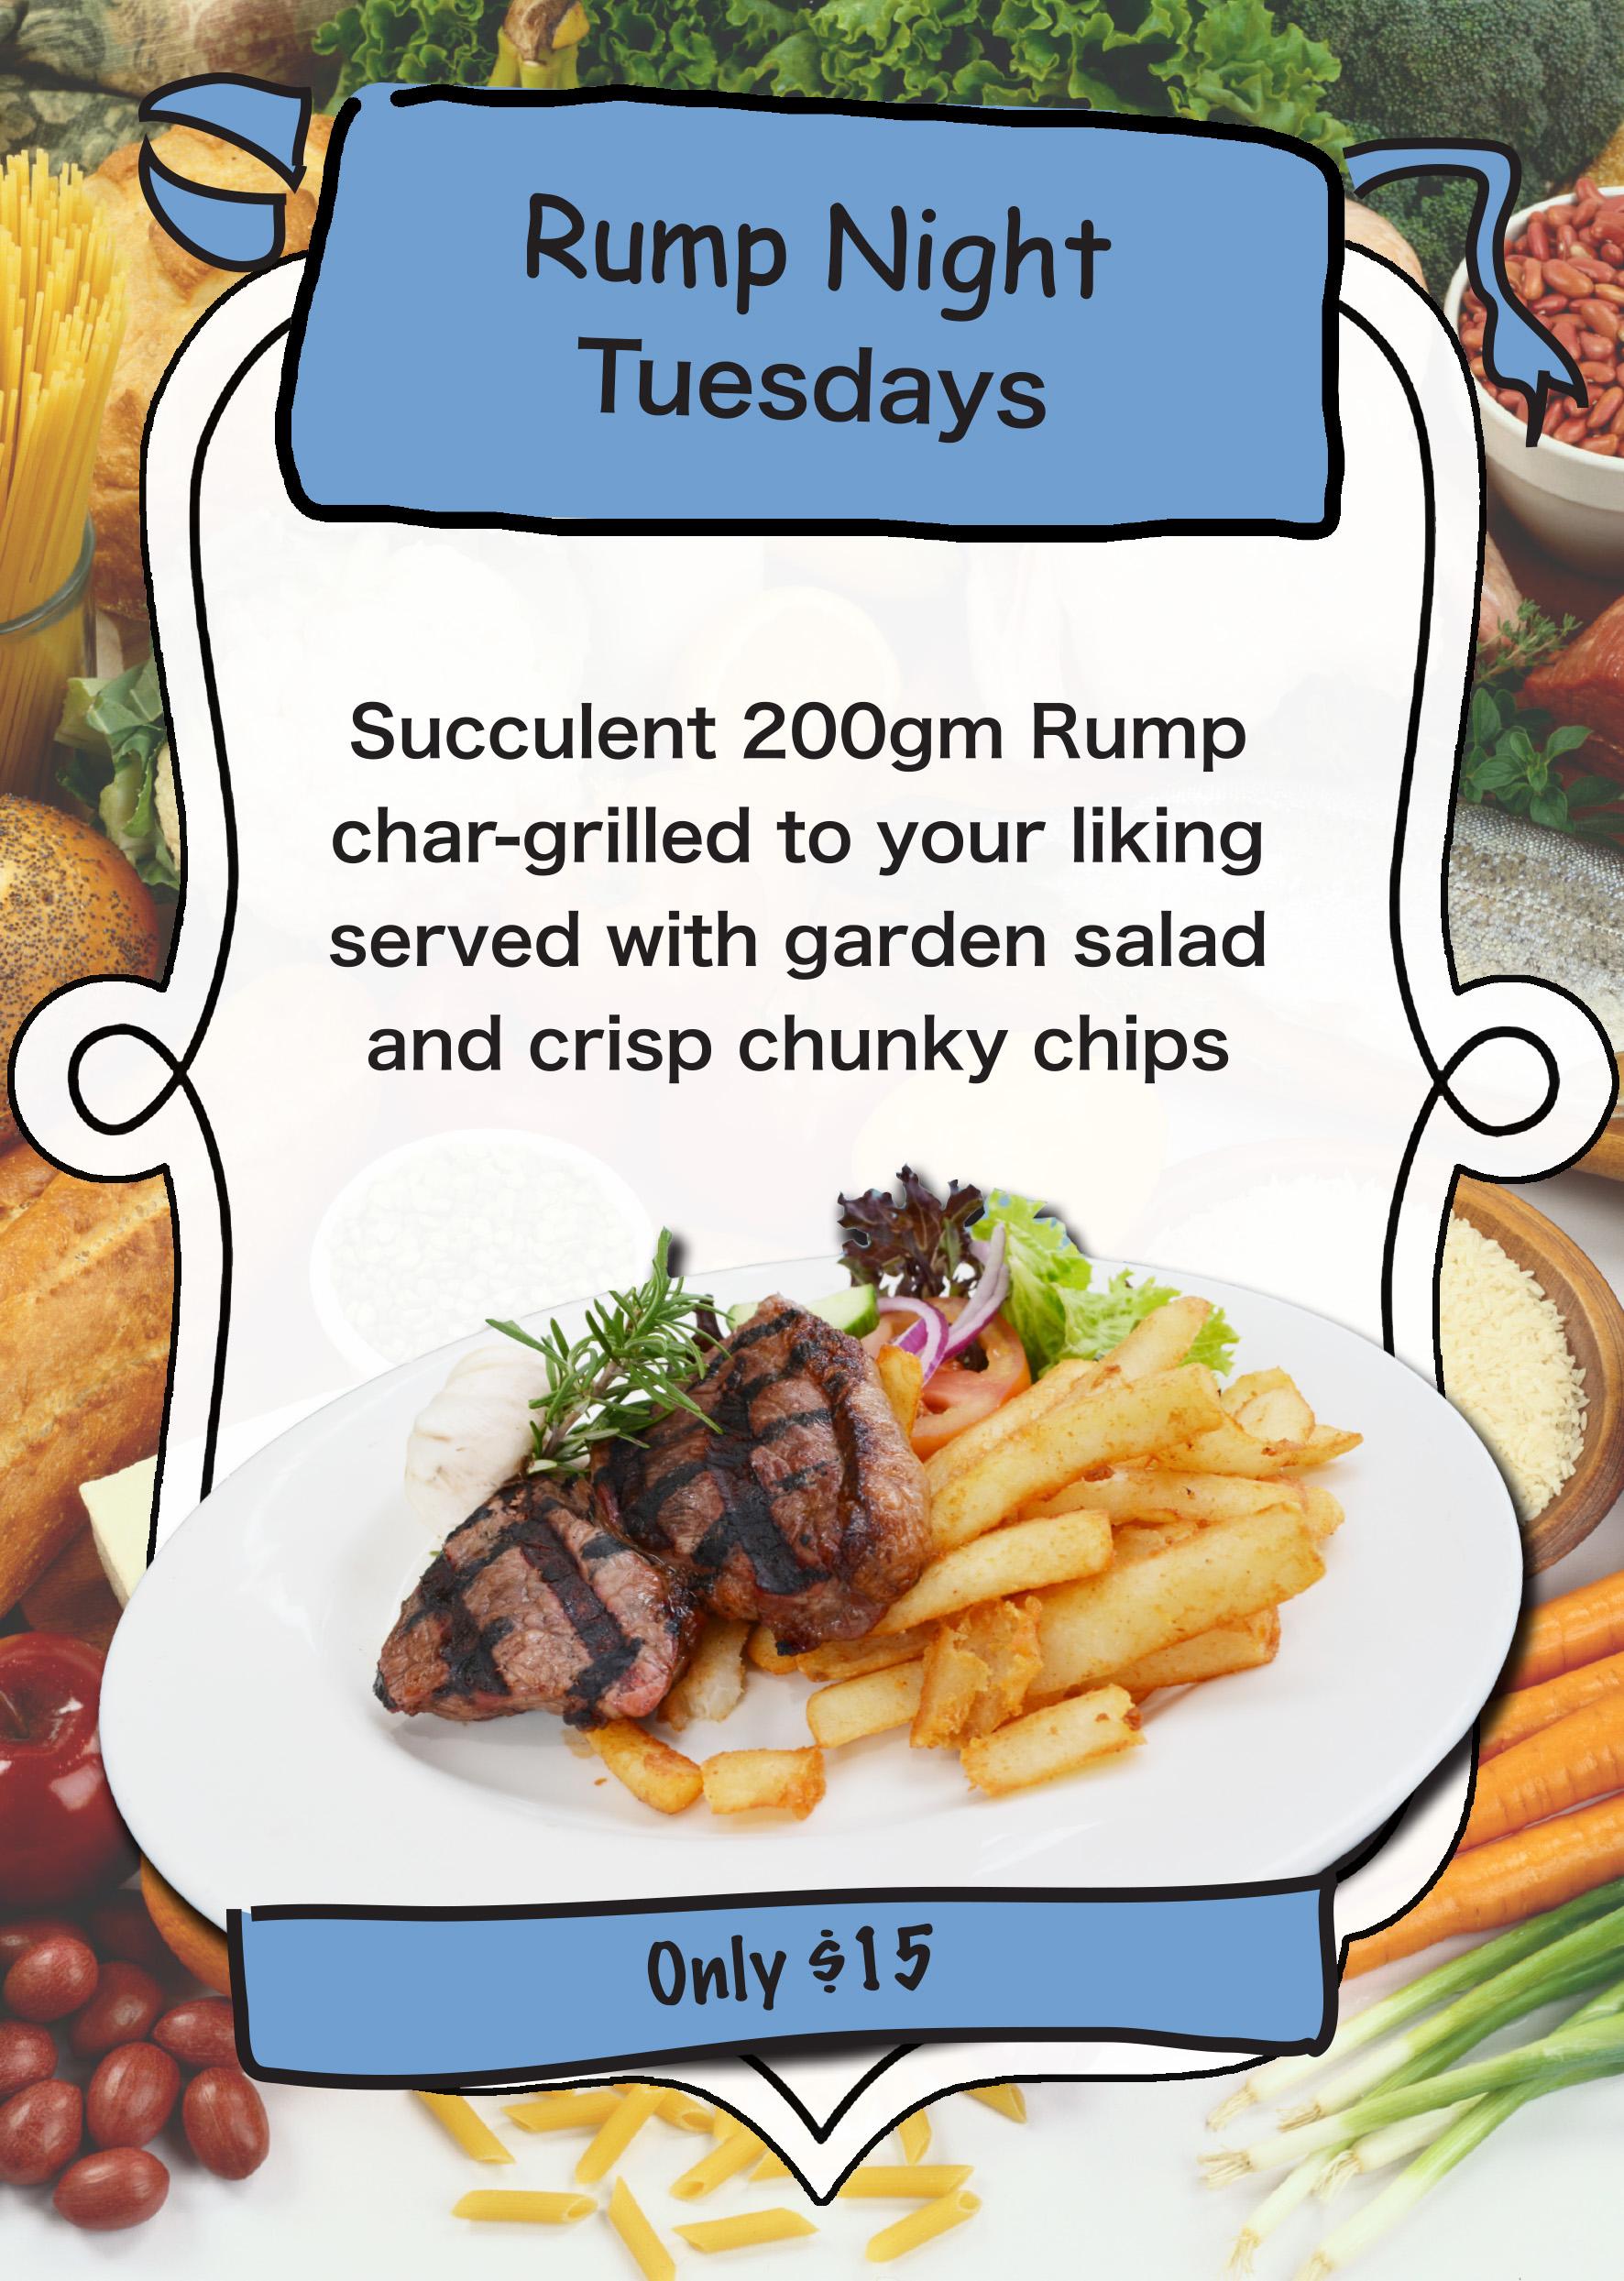 Tuesday Rump Night